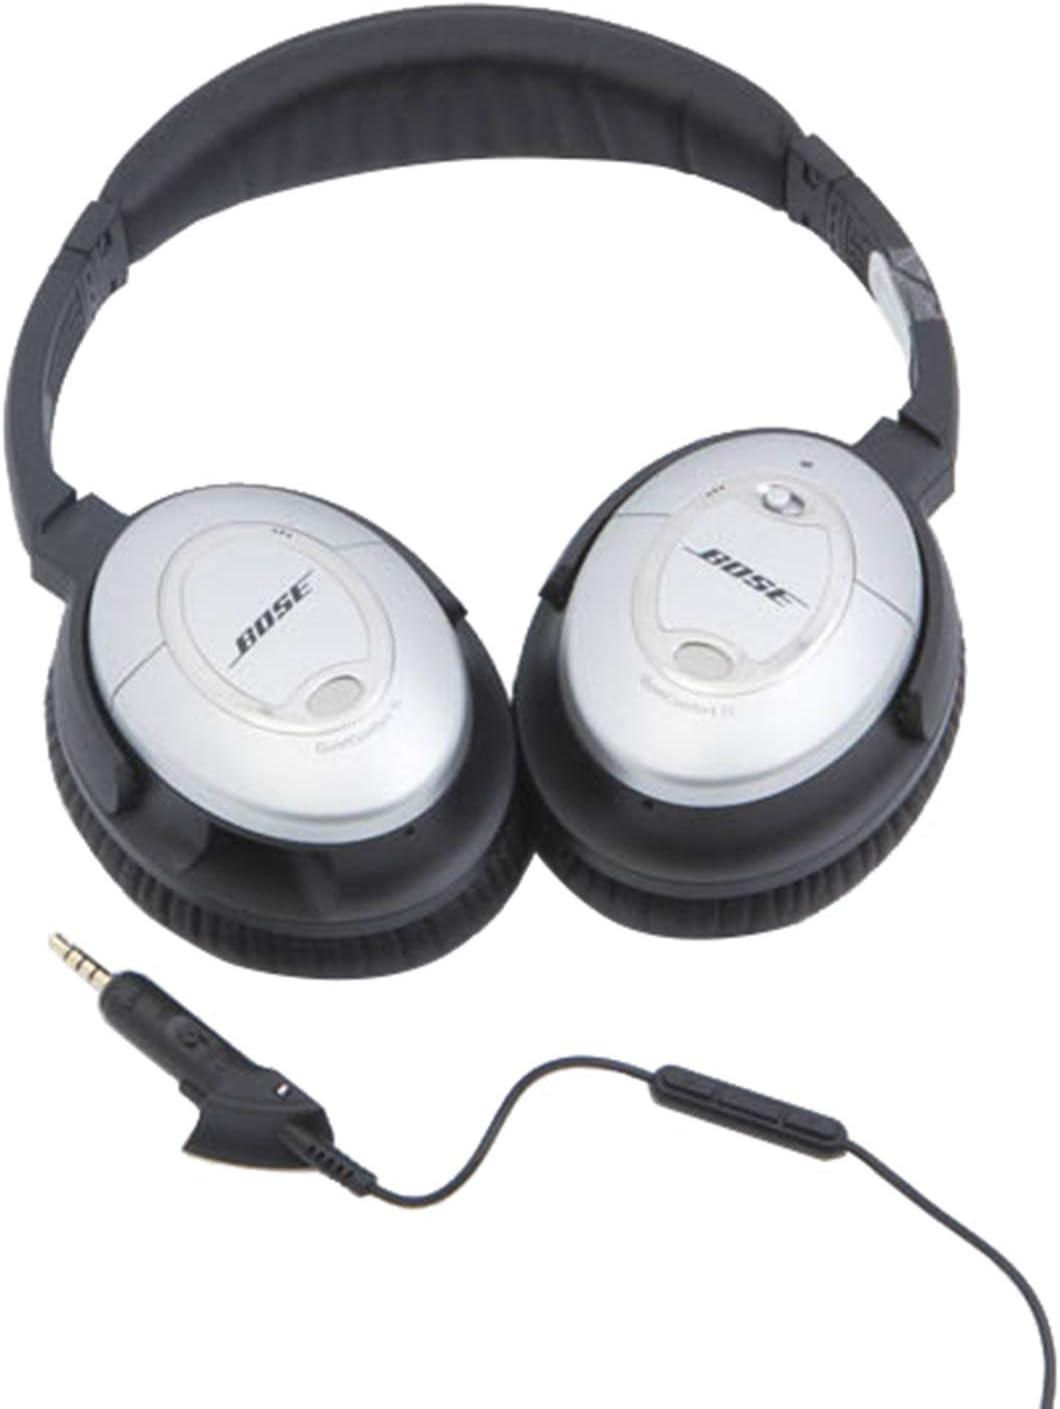 Replacement Audio Cable Cord for Bose QC15 QC2 QuietComfort 15 2 Headphones Black